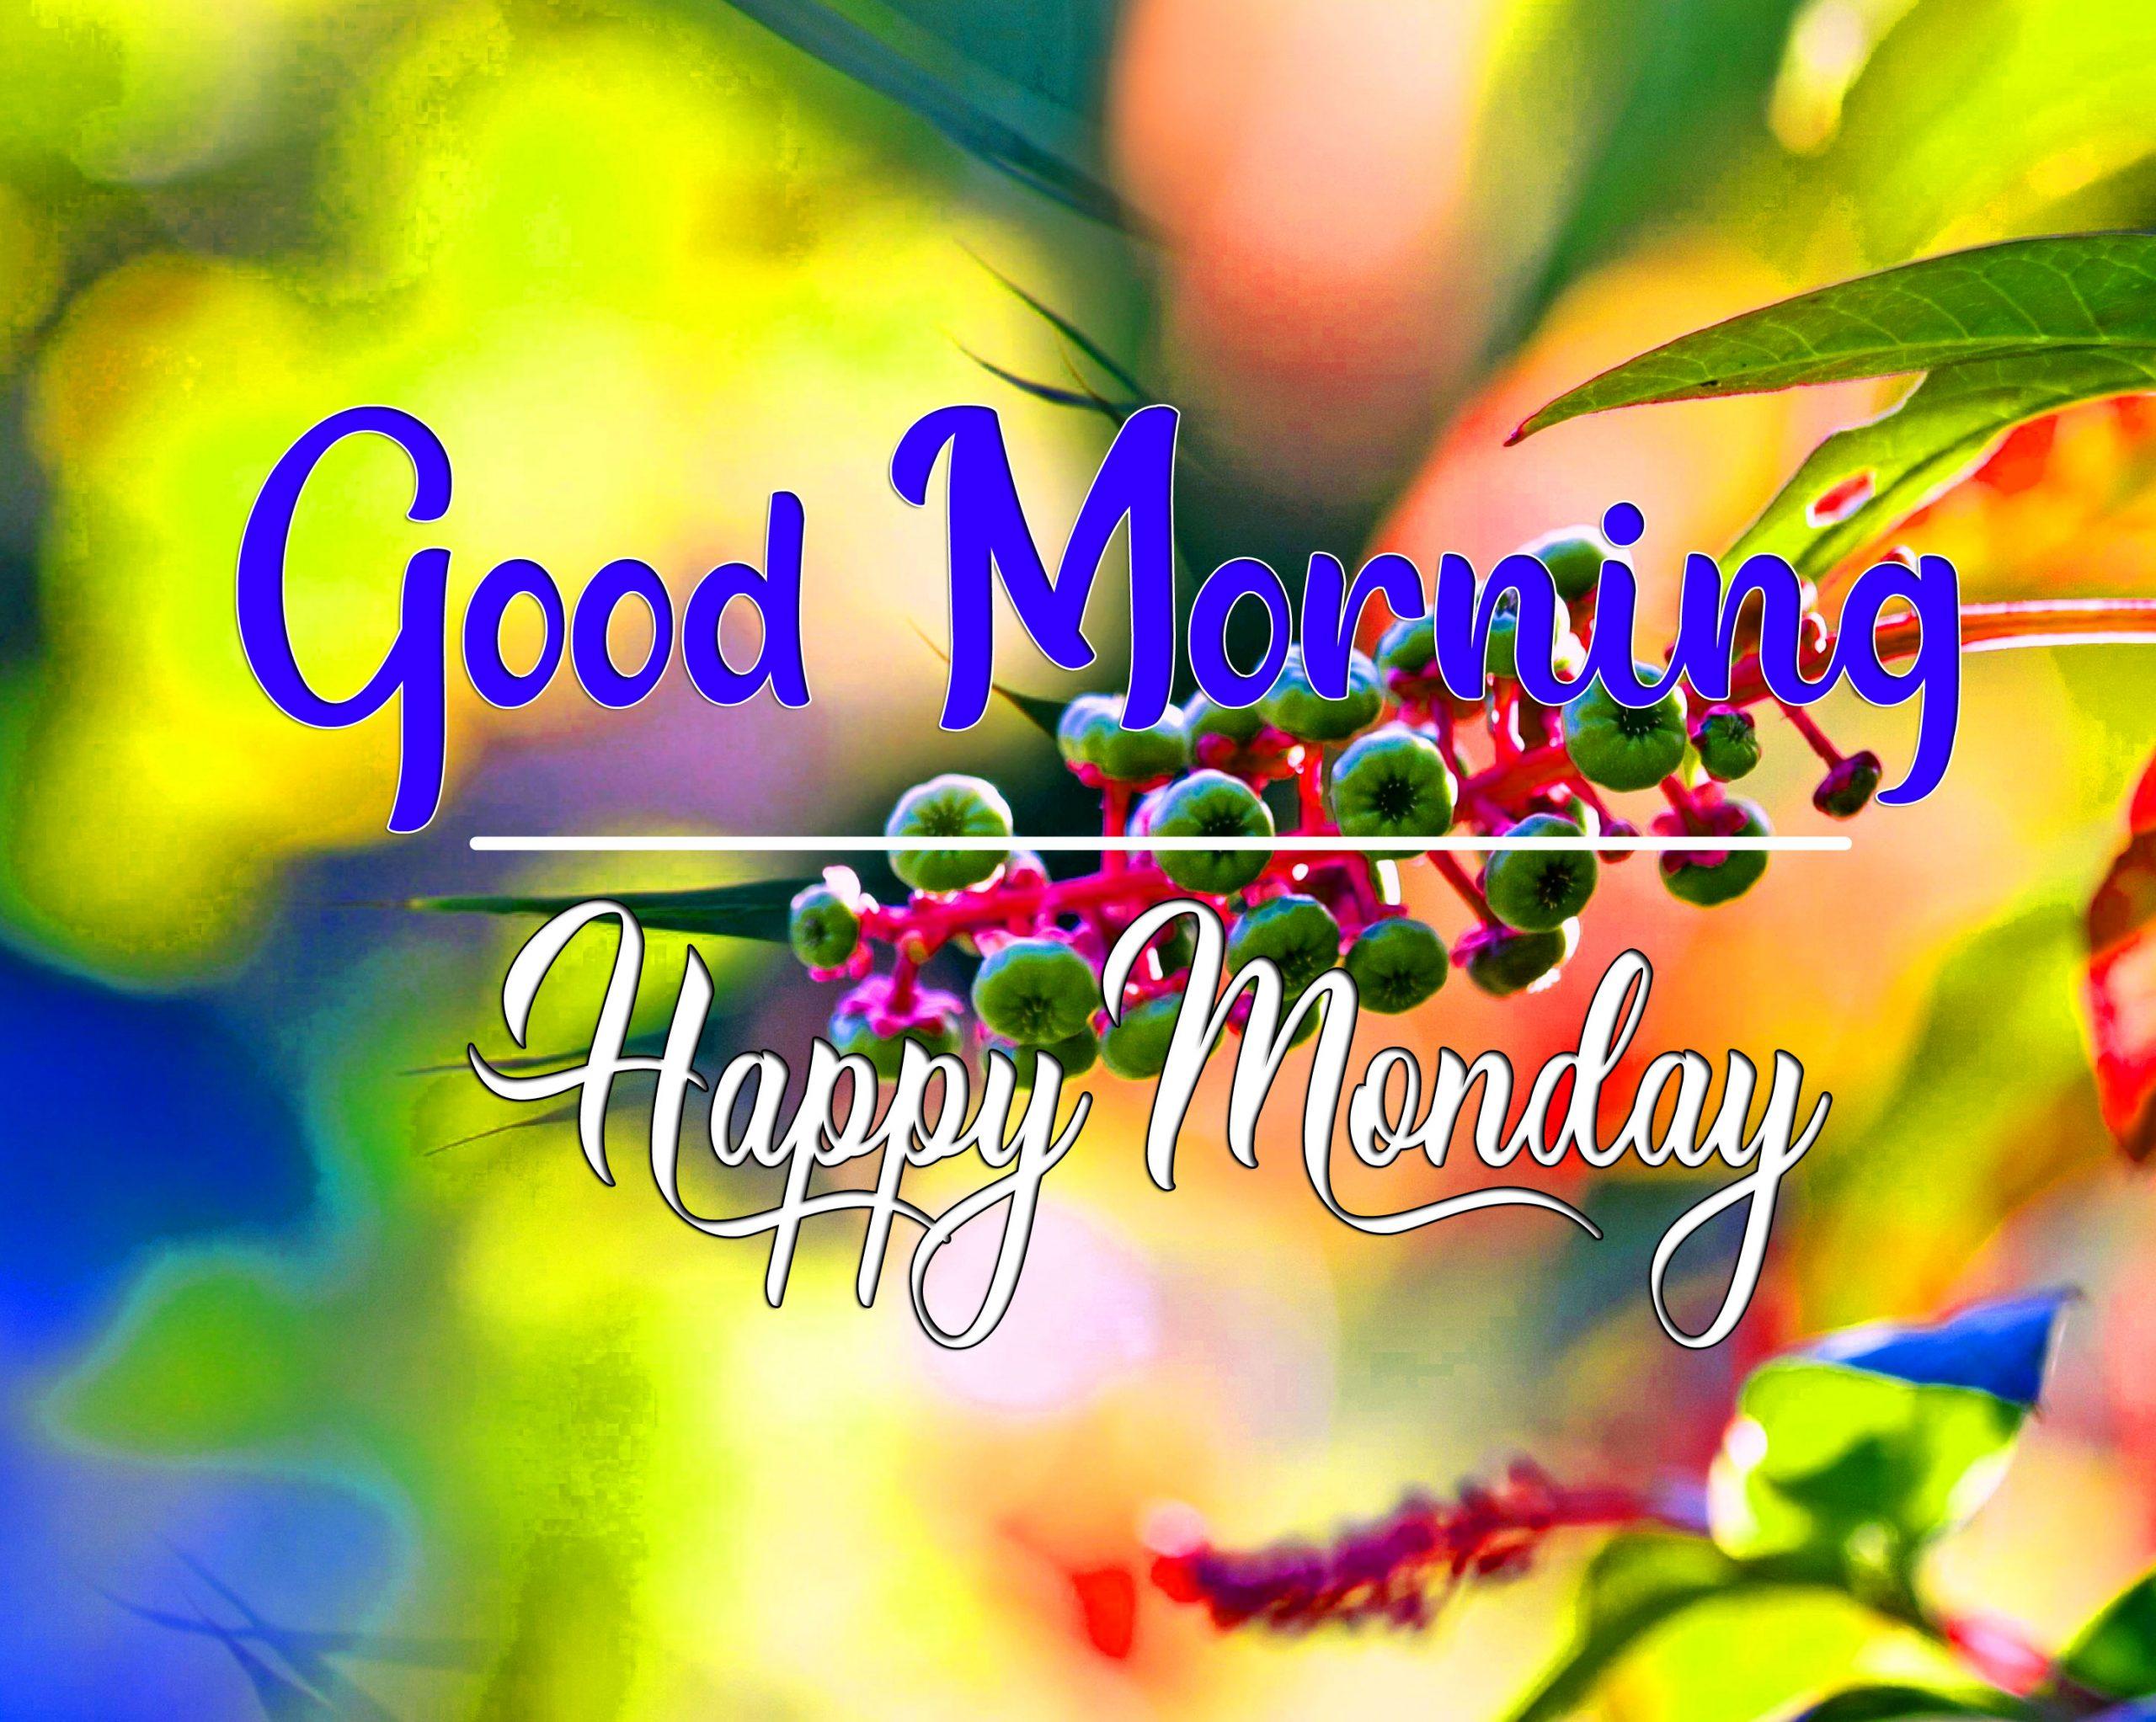 Monday Good Morning Wallpaper for Status 1